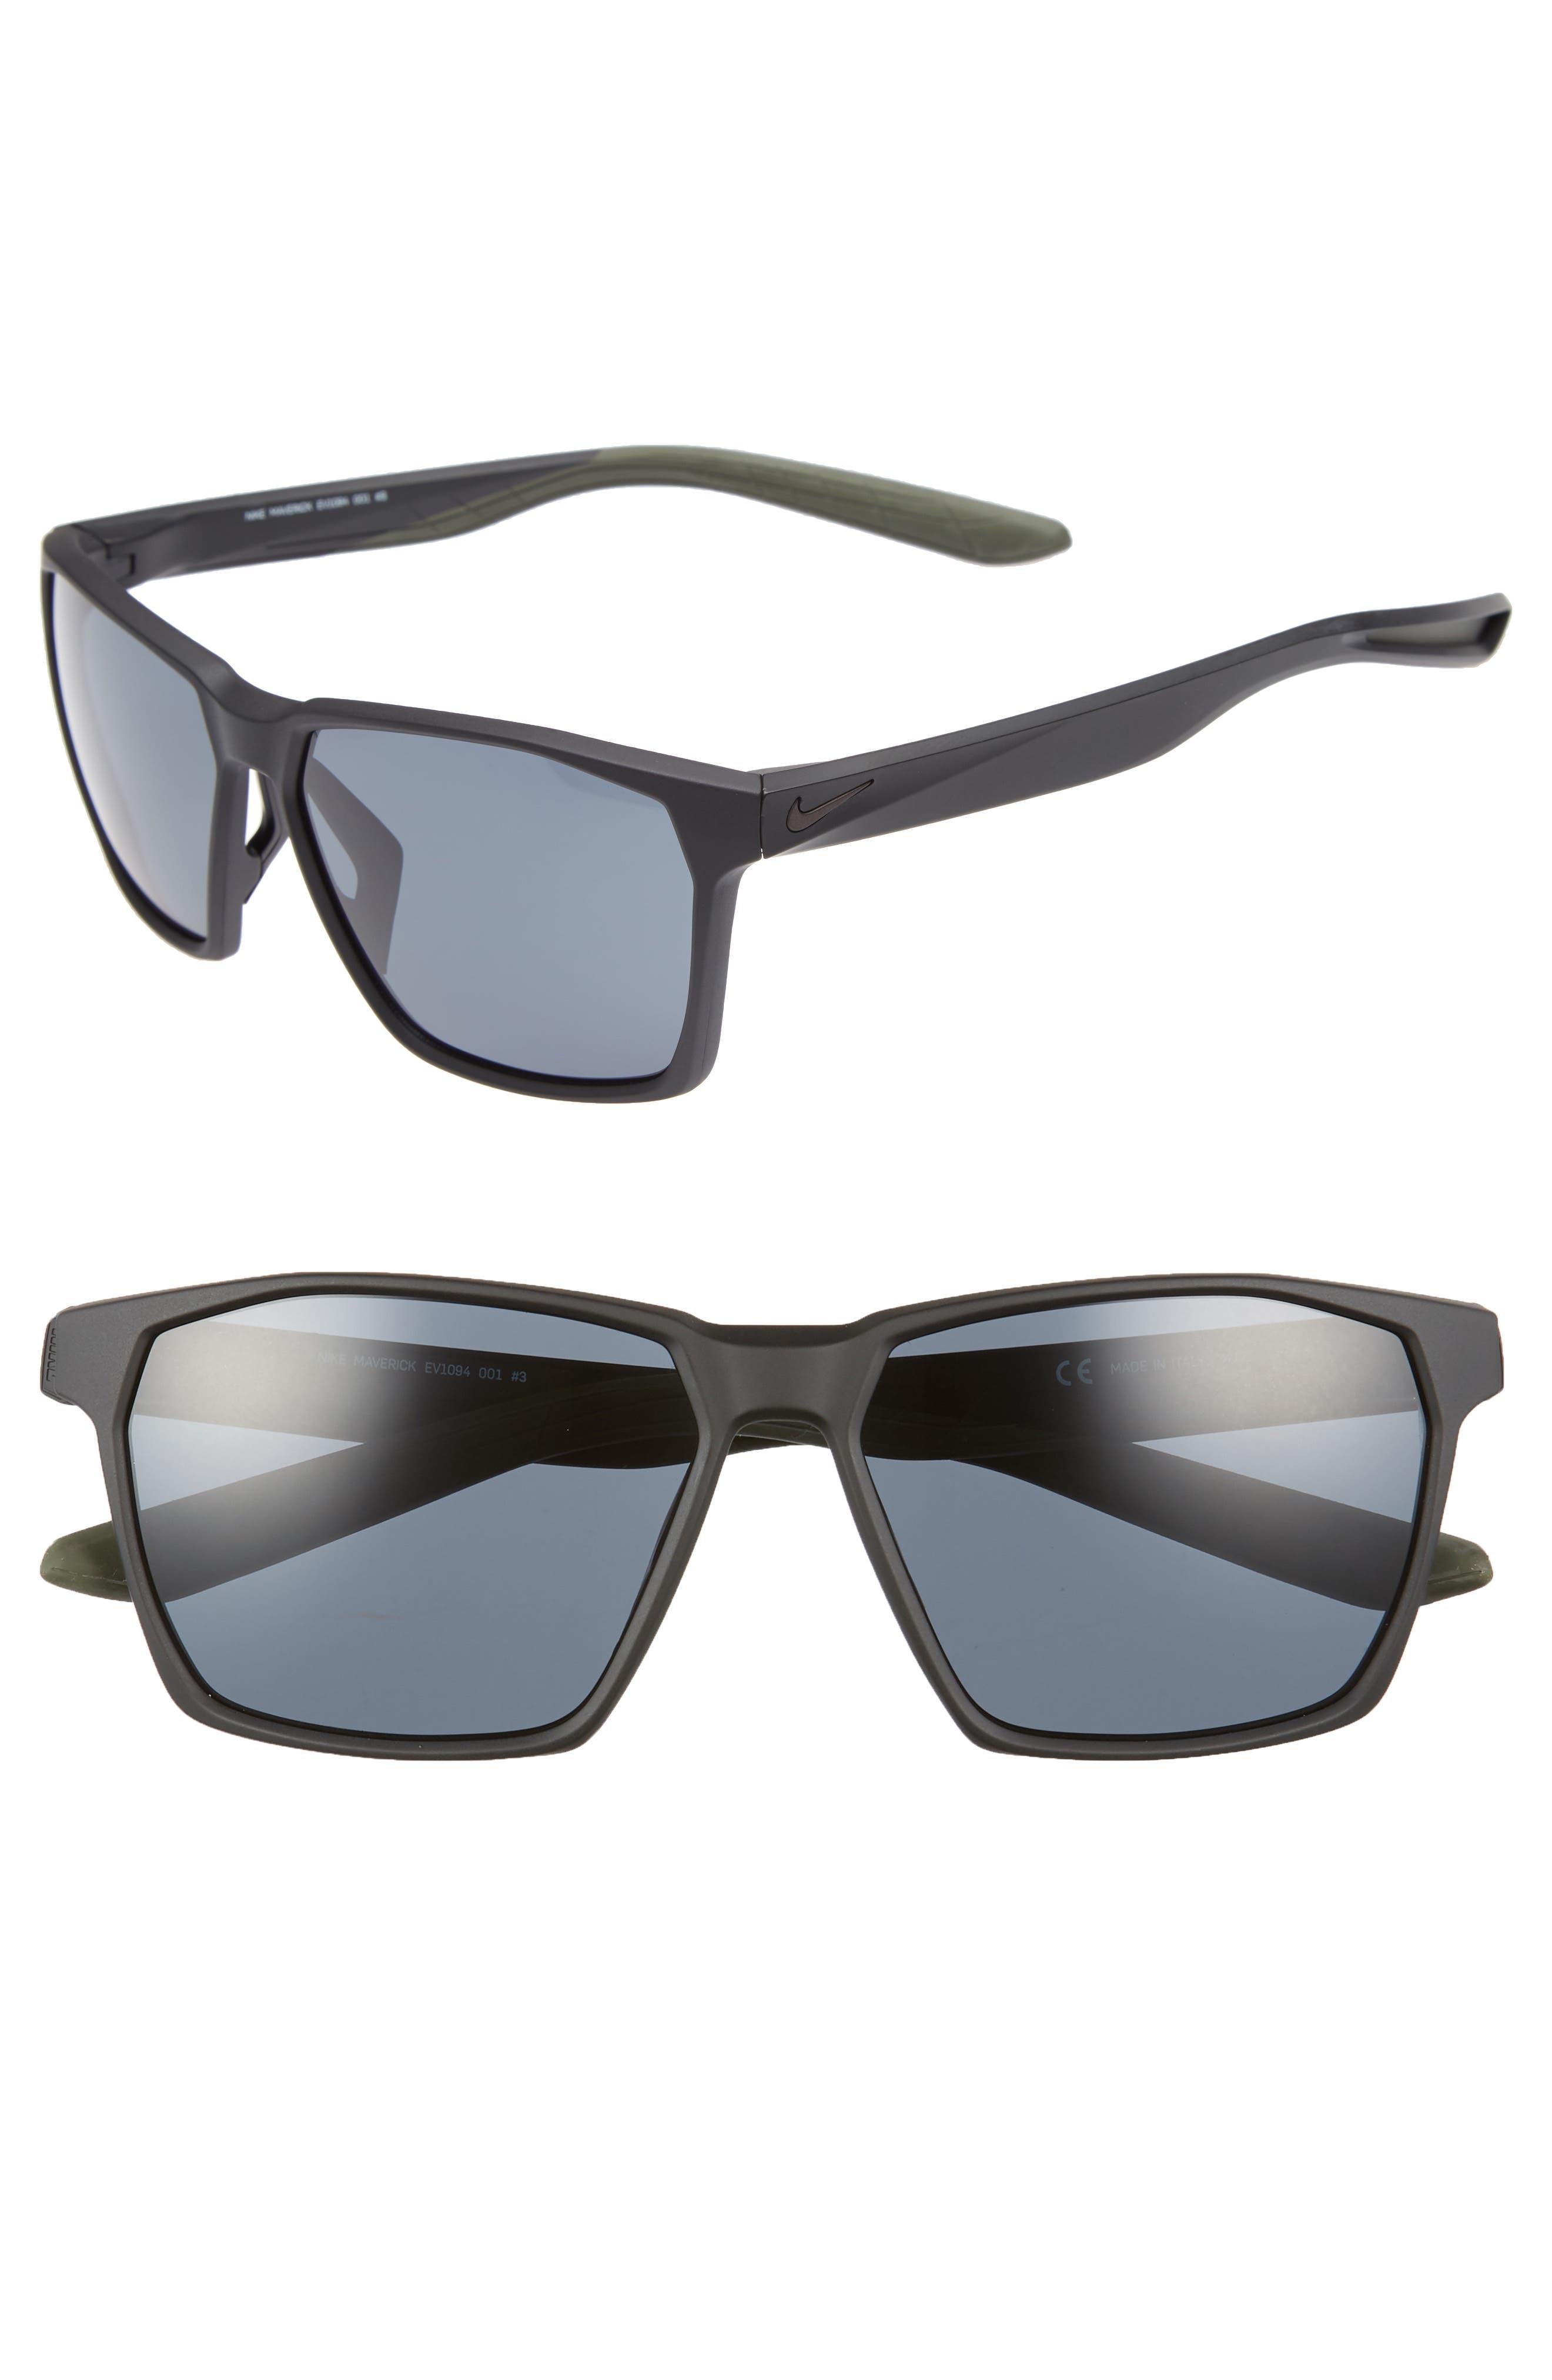 Maverick 59mm Sunglasses,                             Main thumbnail 1, color,                             MATTE BLACK/ GREY